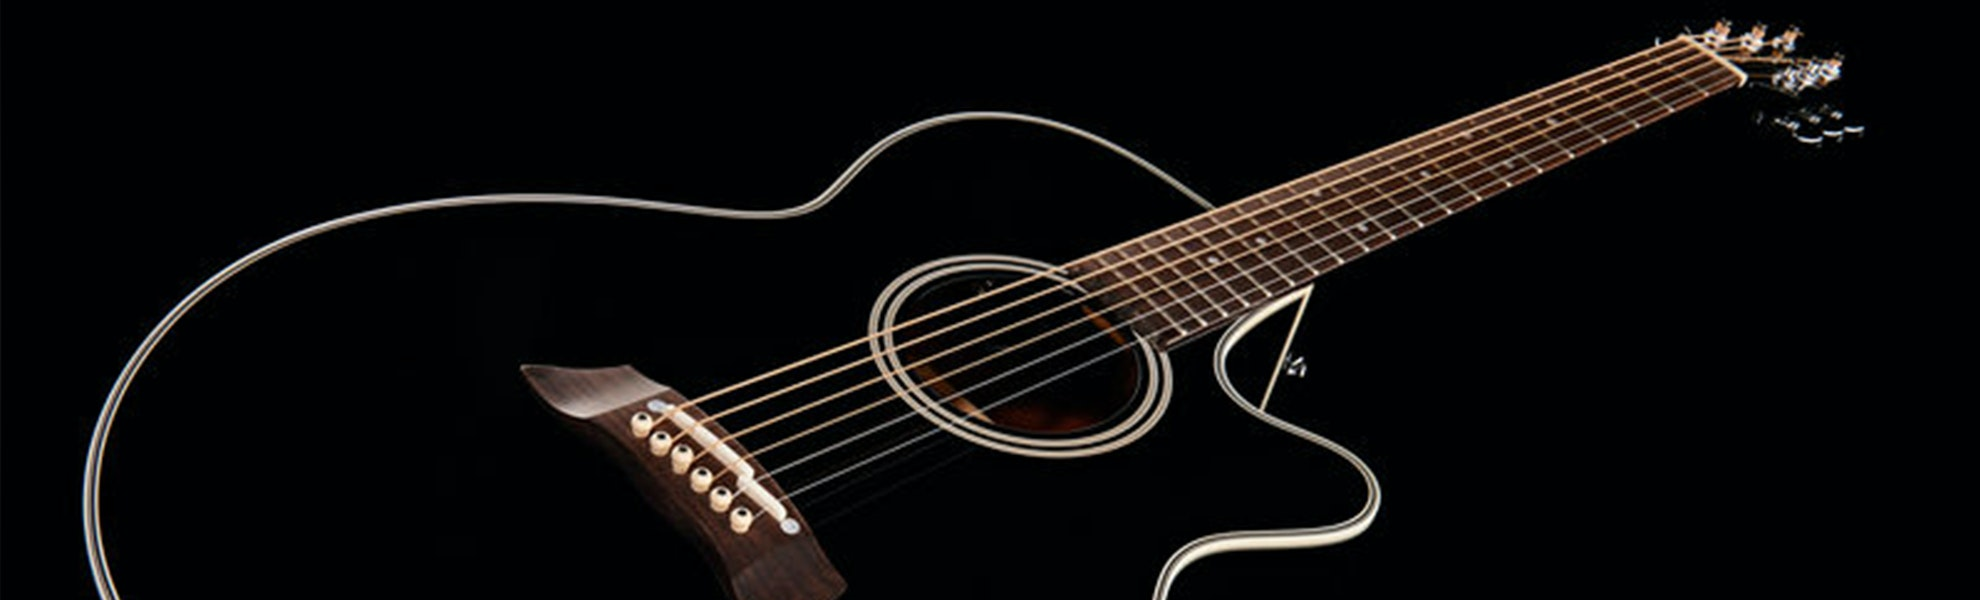 Takamine EF261SBL Acoustic-Electric Guitar